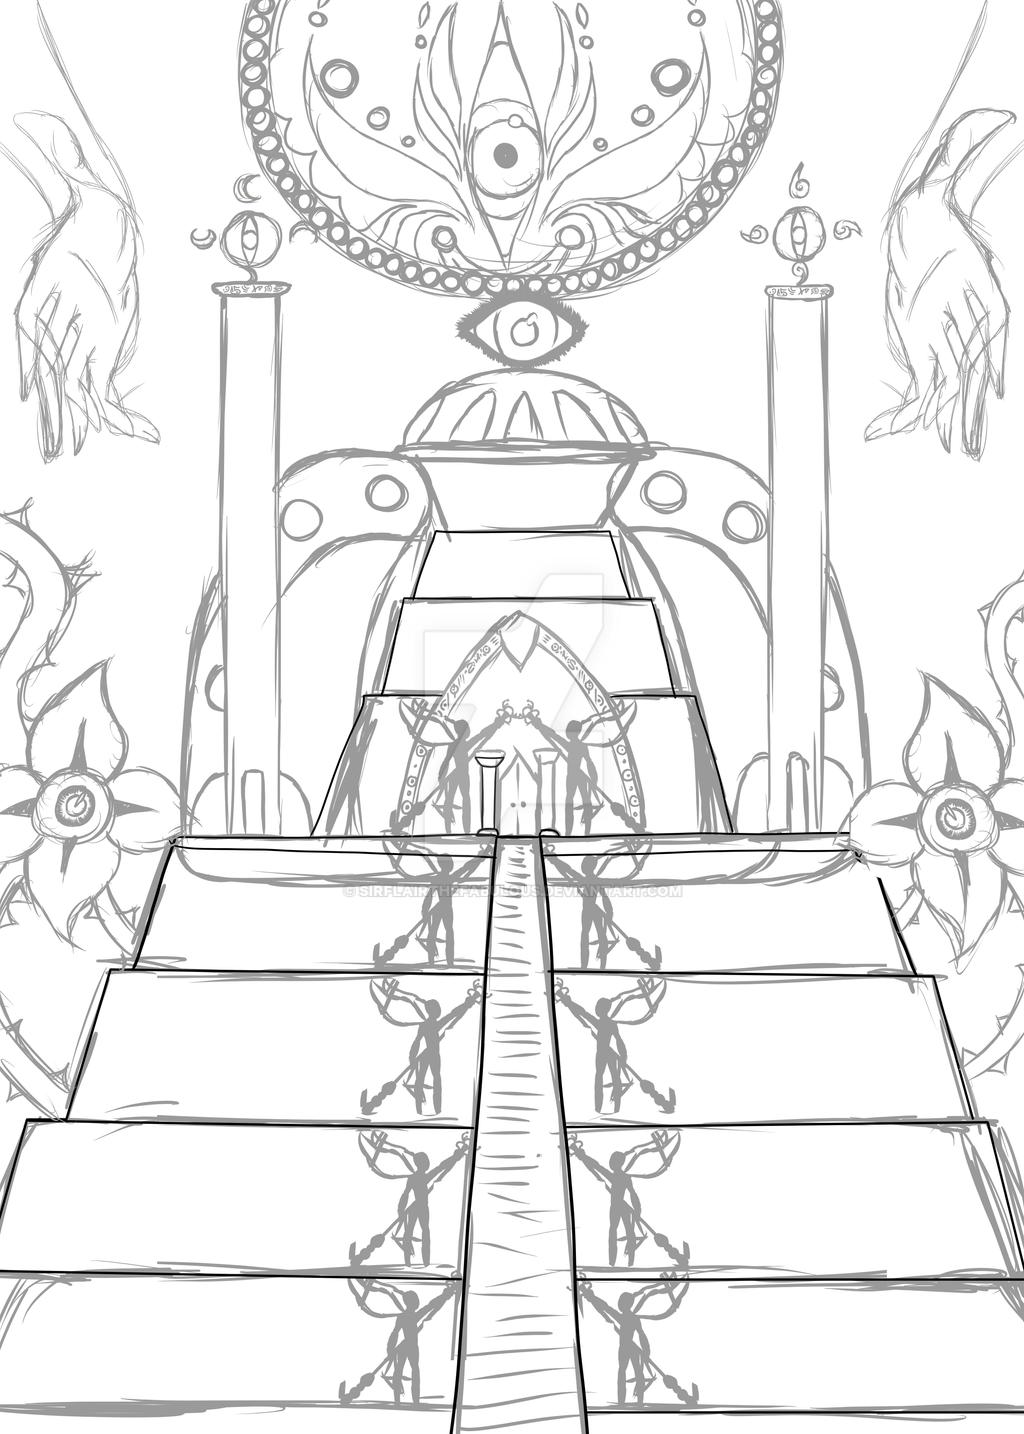 A sketch (blegh) by SirFlairTheFabulous